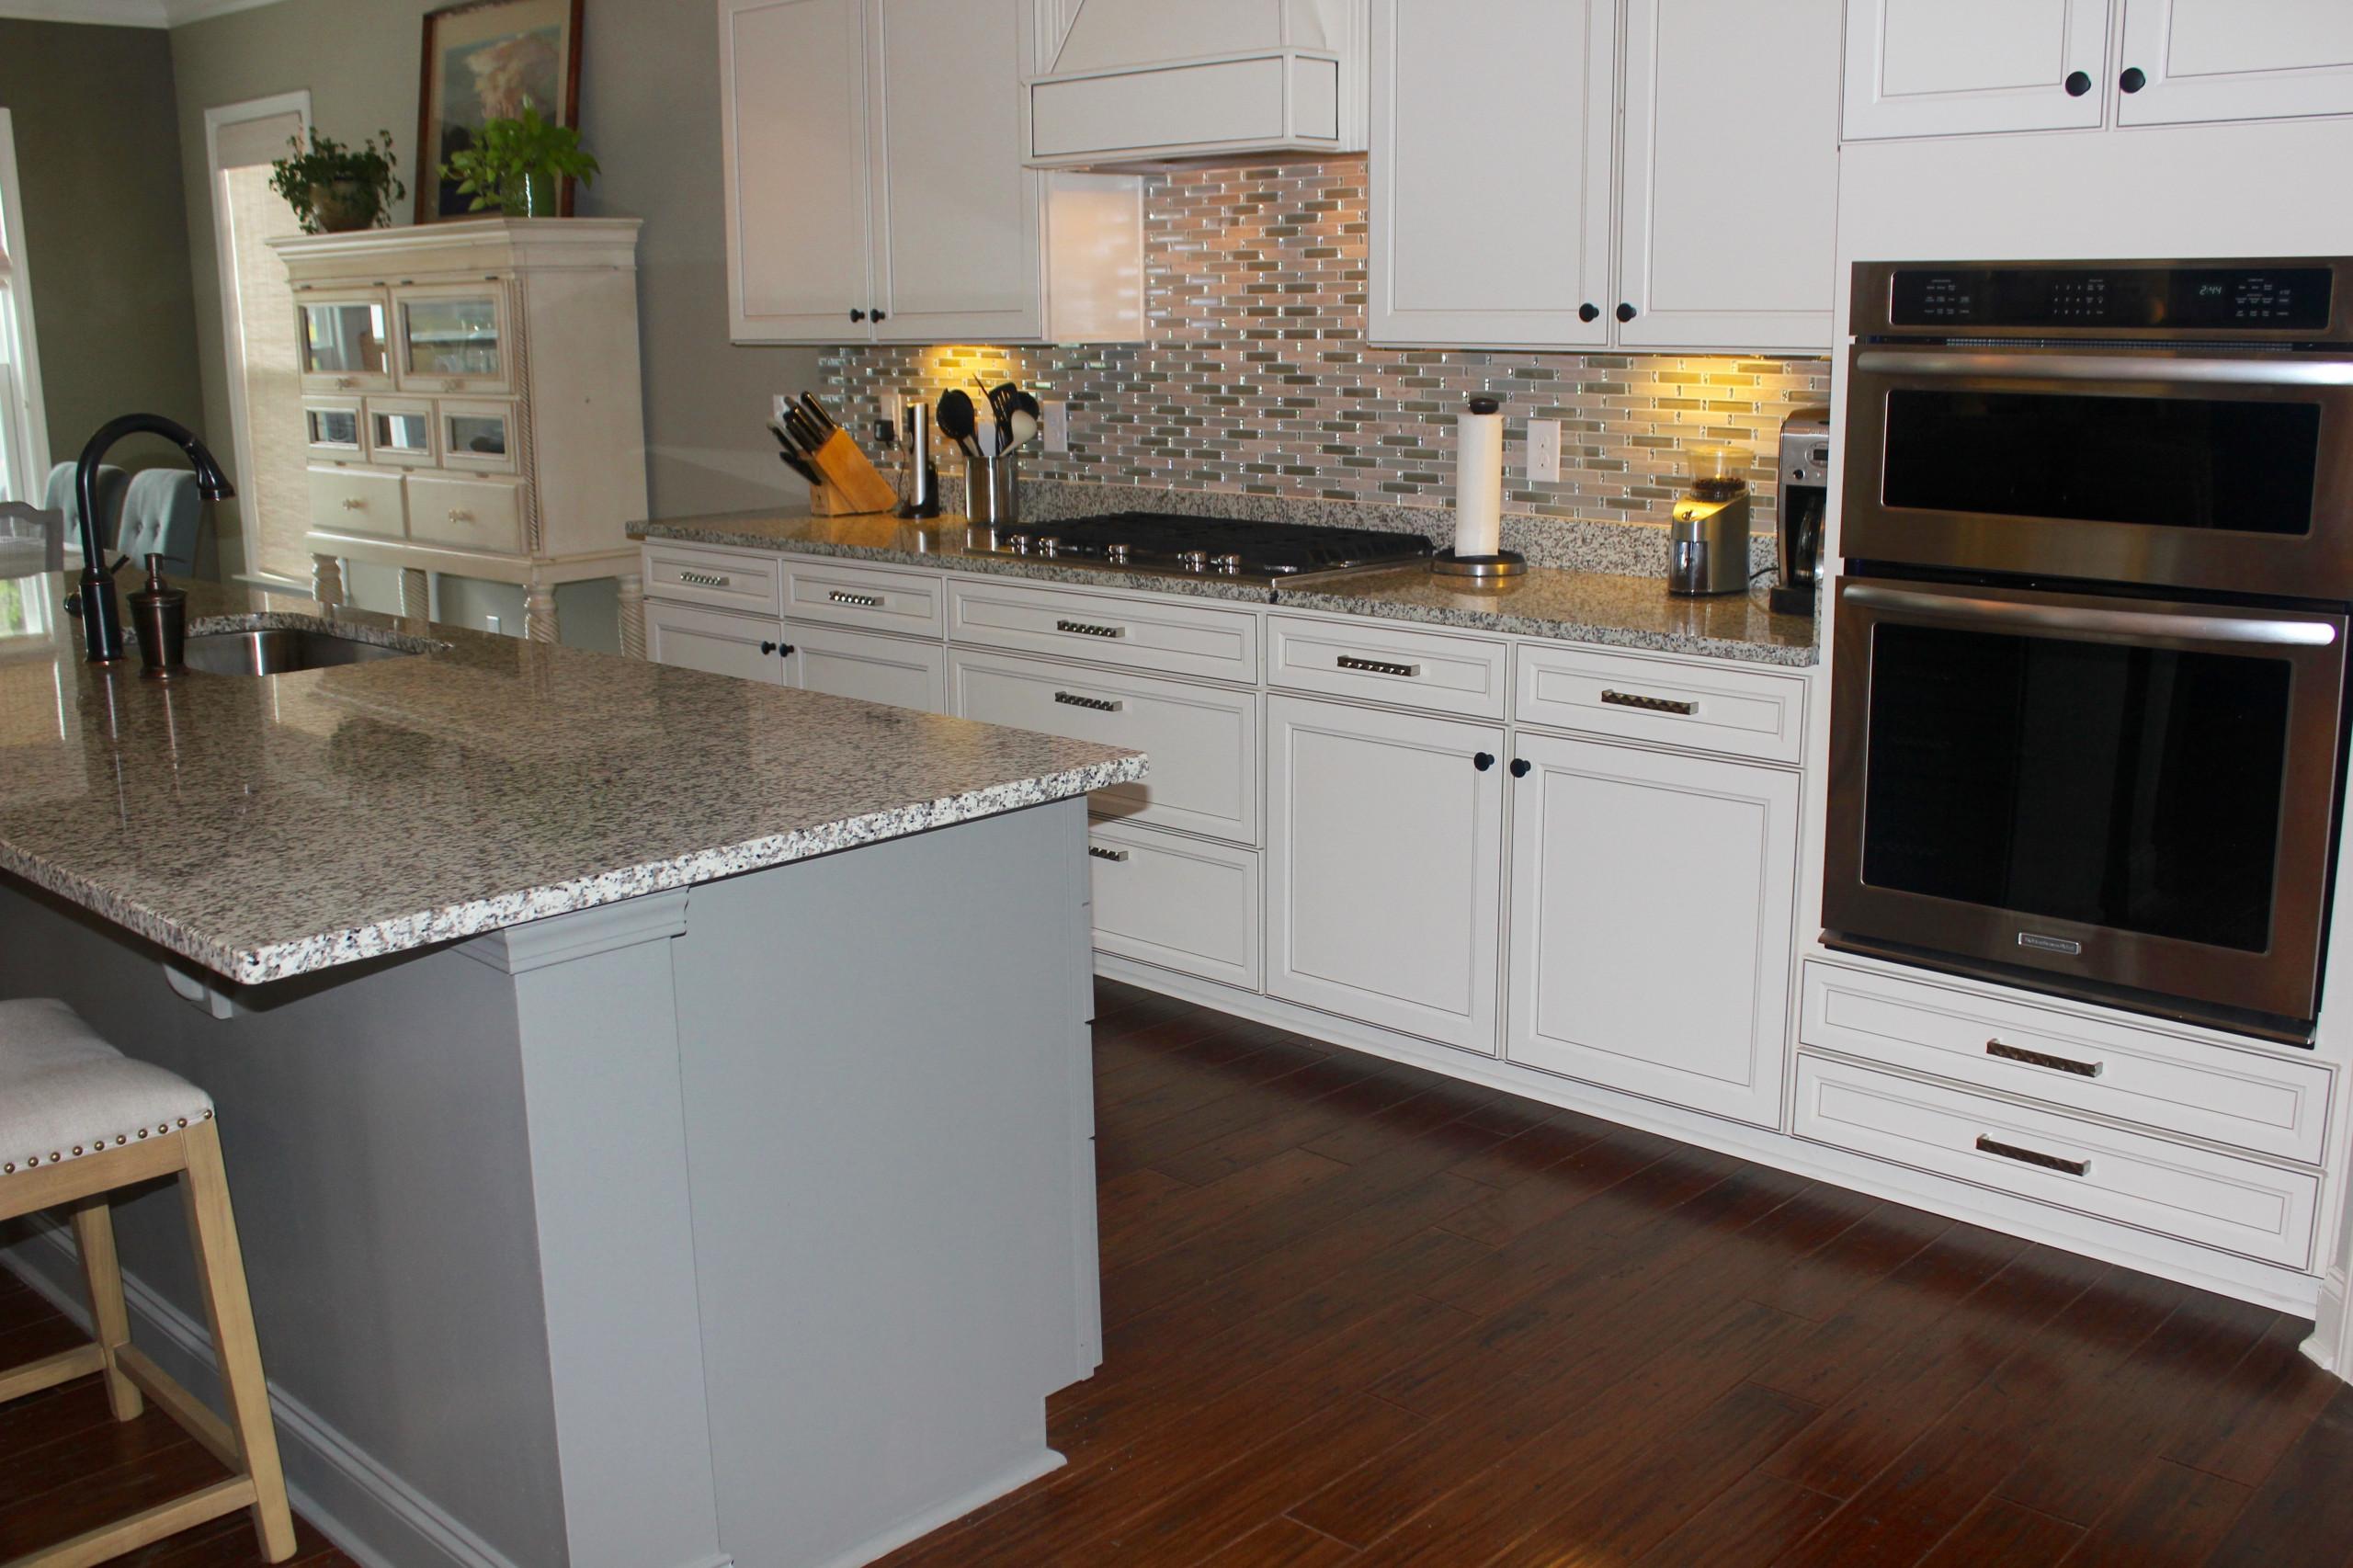 Kitchen Island was painted a medium gray